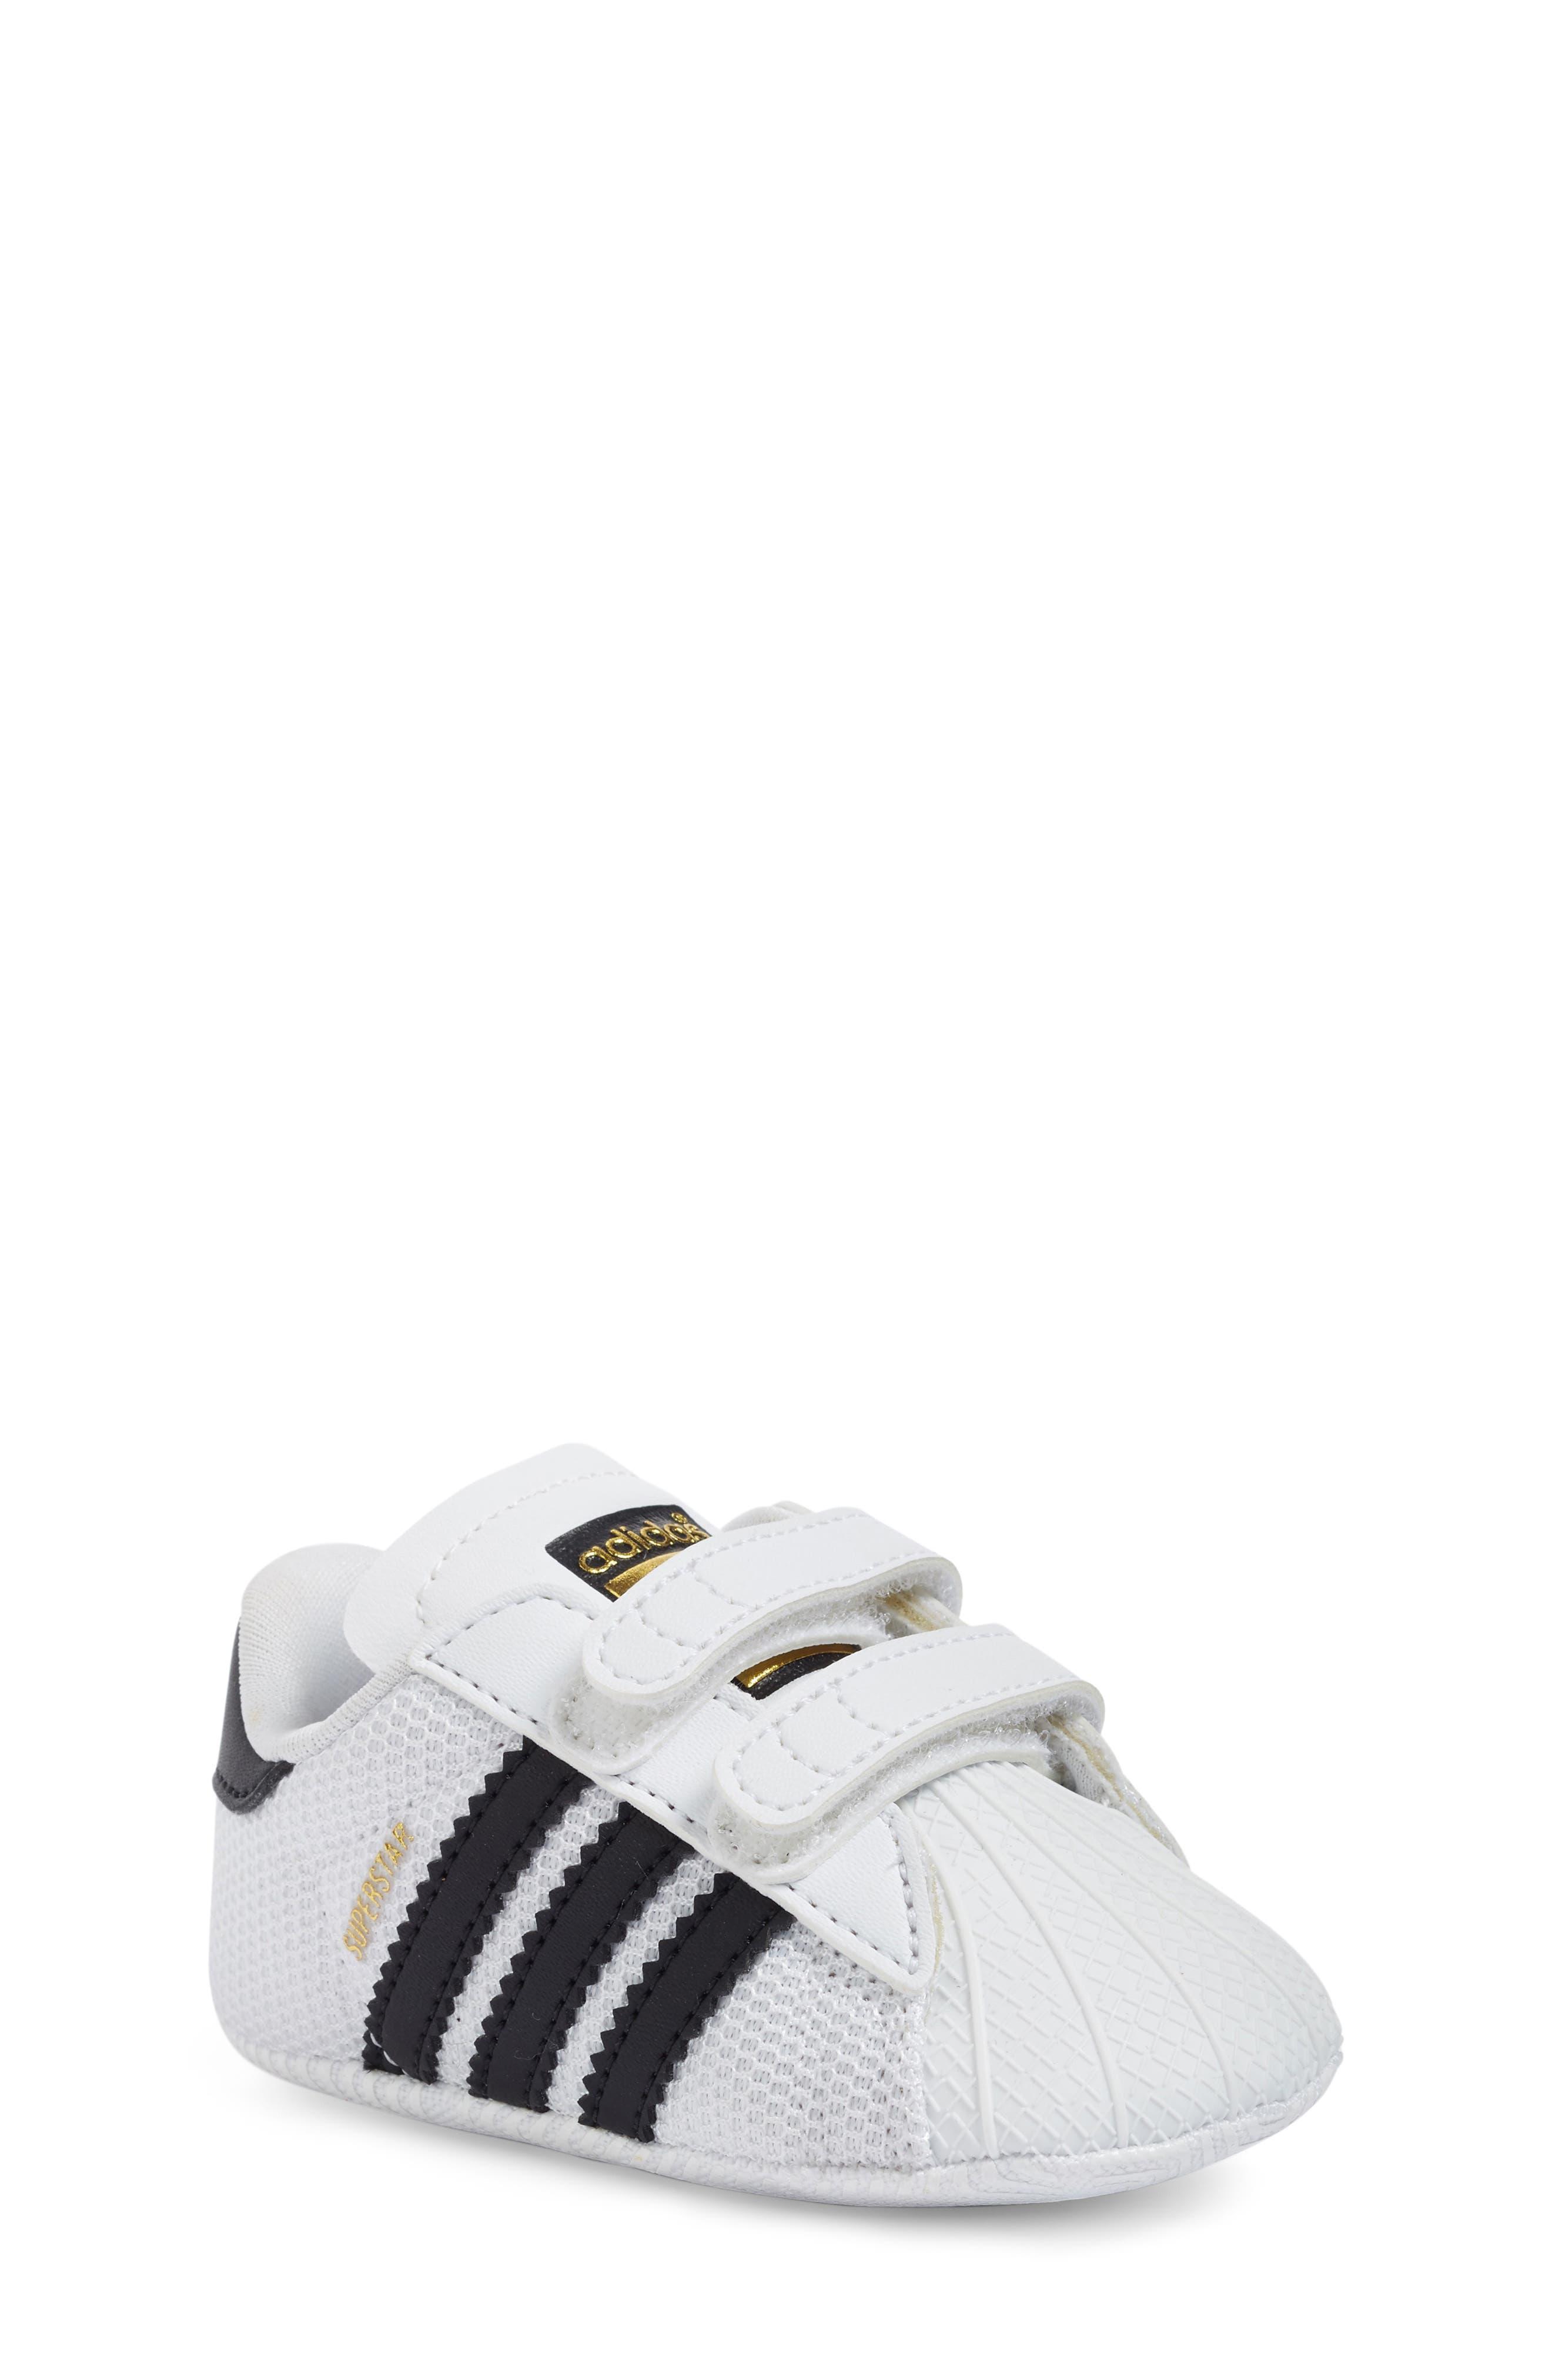 ADIDAS Superstar Sneaker, Main, color, WHITE/ BLACK